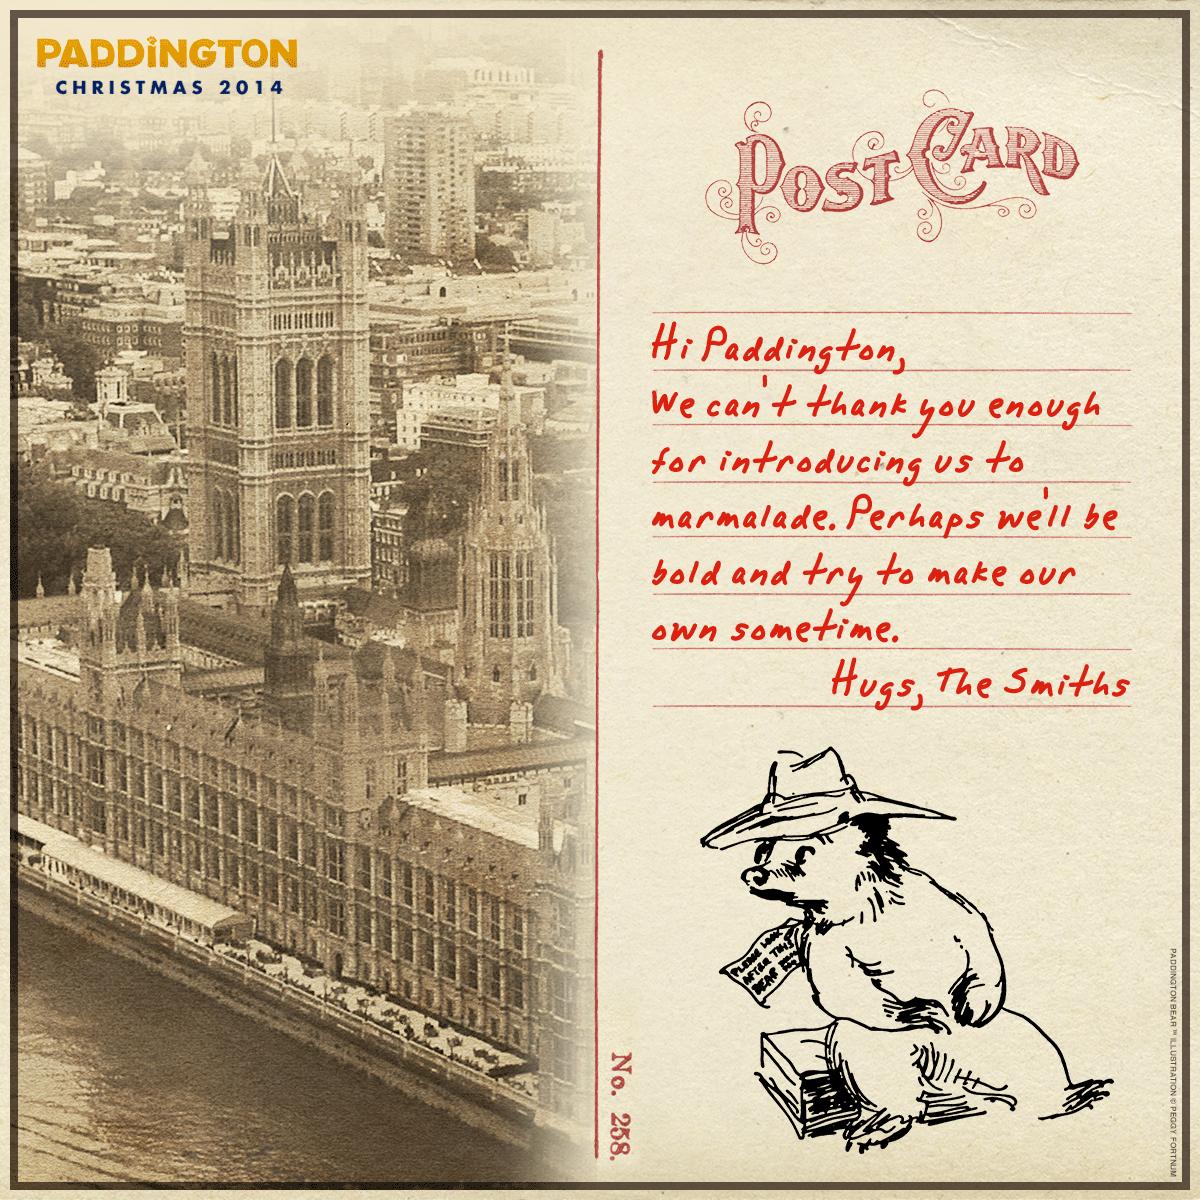 Seems that Paddington isn't the only one who loves marmalade. | Paddington